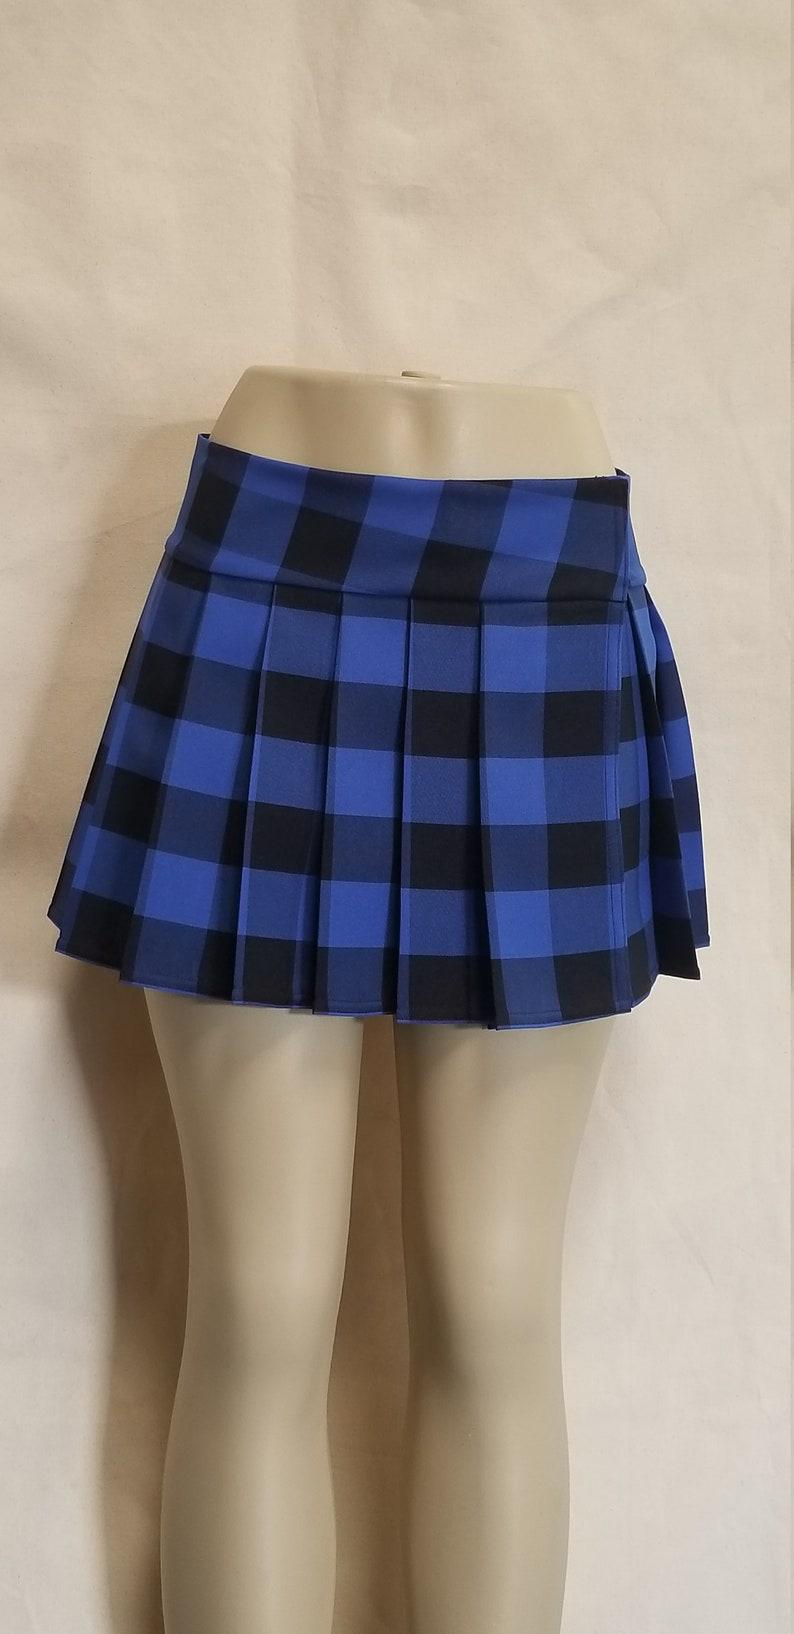 Regular Junior Blue Tartan Stewart School Girl Plaid Skirt Etsy